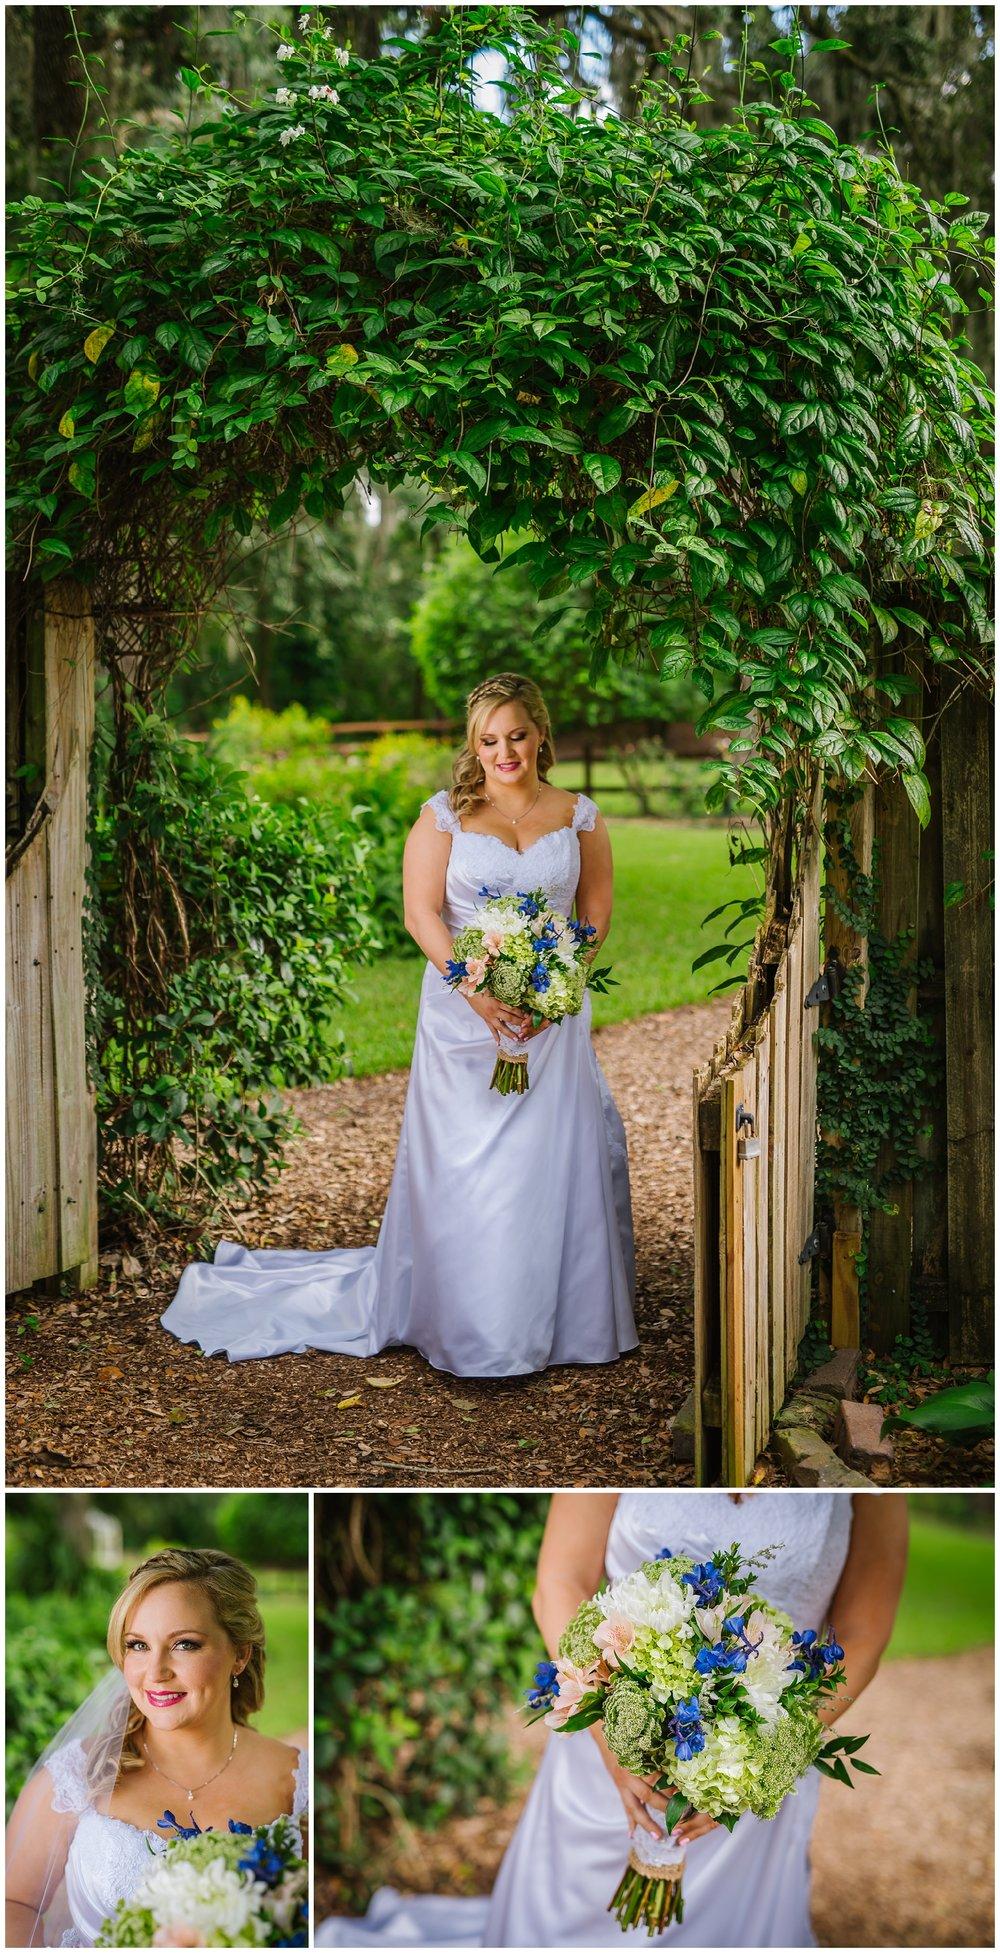 Cross-creek-ranch-navy-bush-tampa-wedding-photogrpaher_0009.jpg